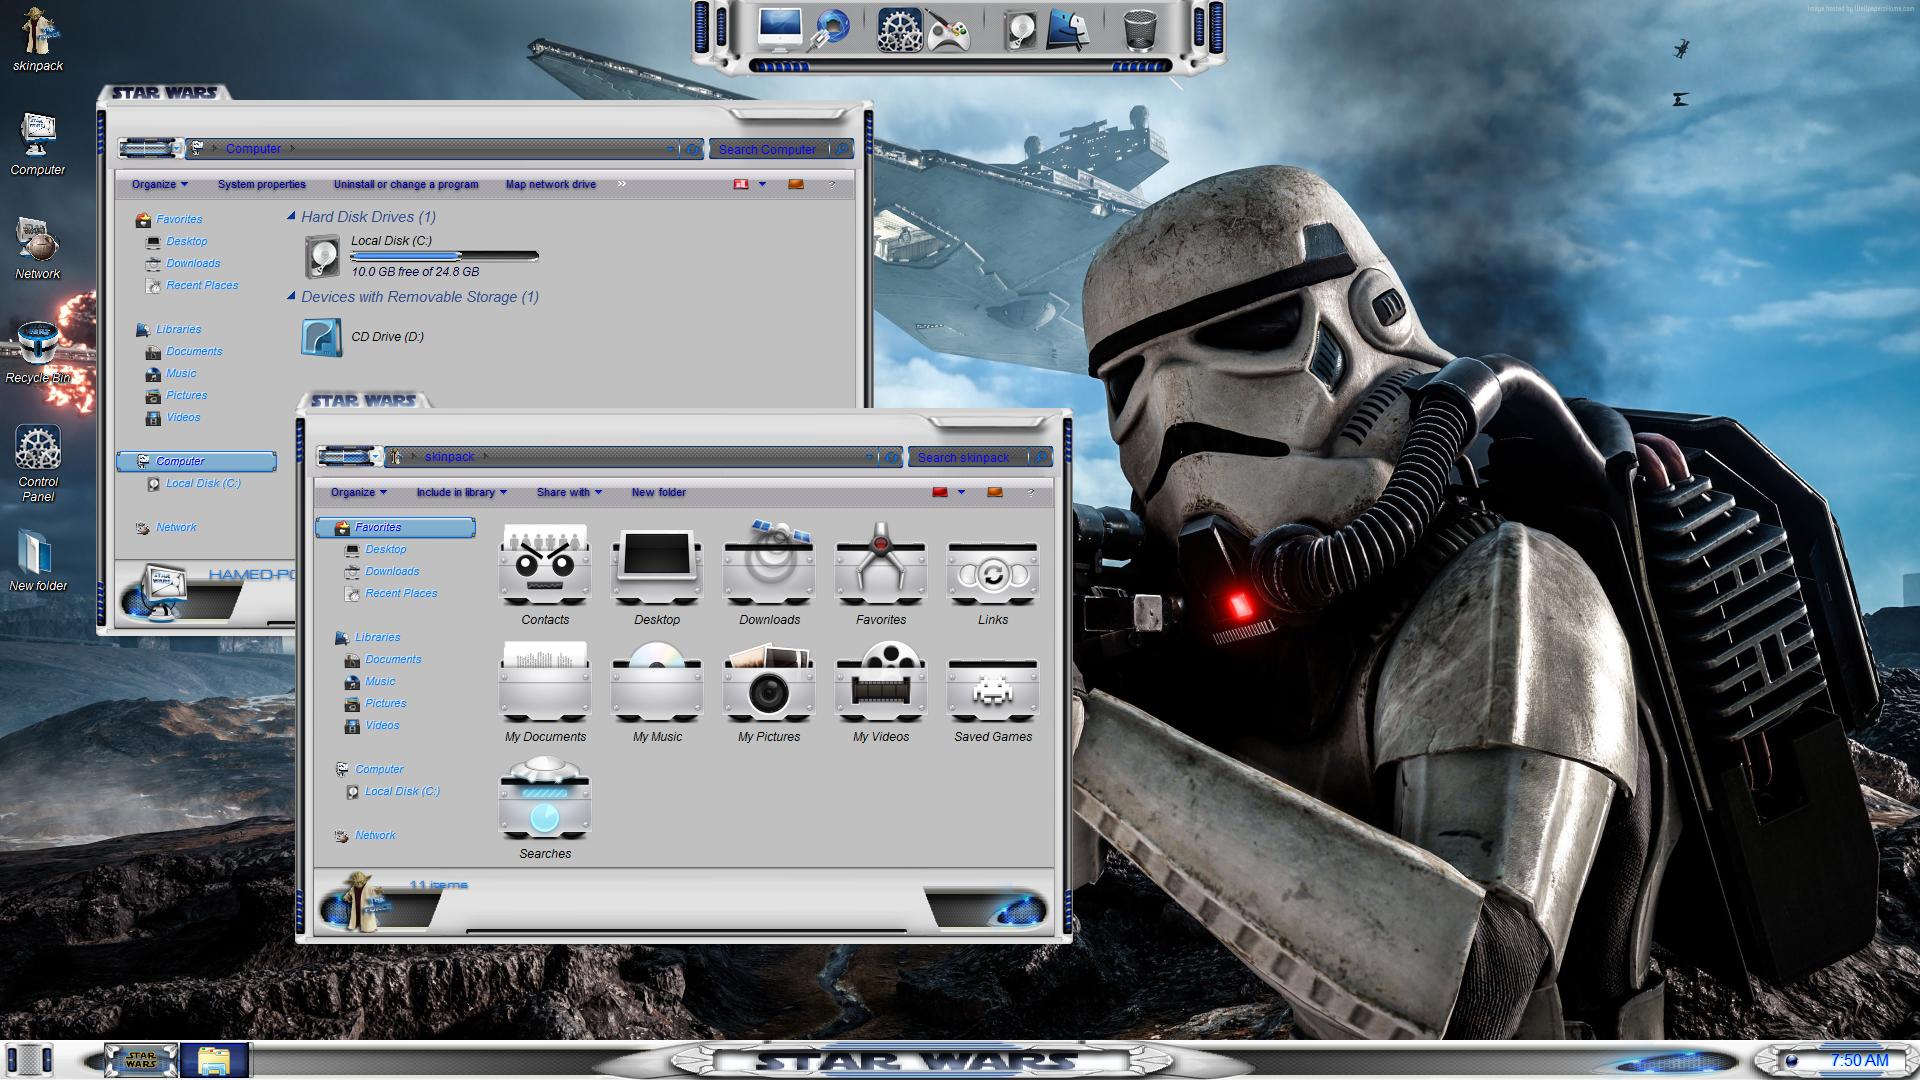 Star Wars SkinPack for Windows 7